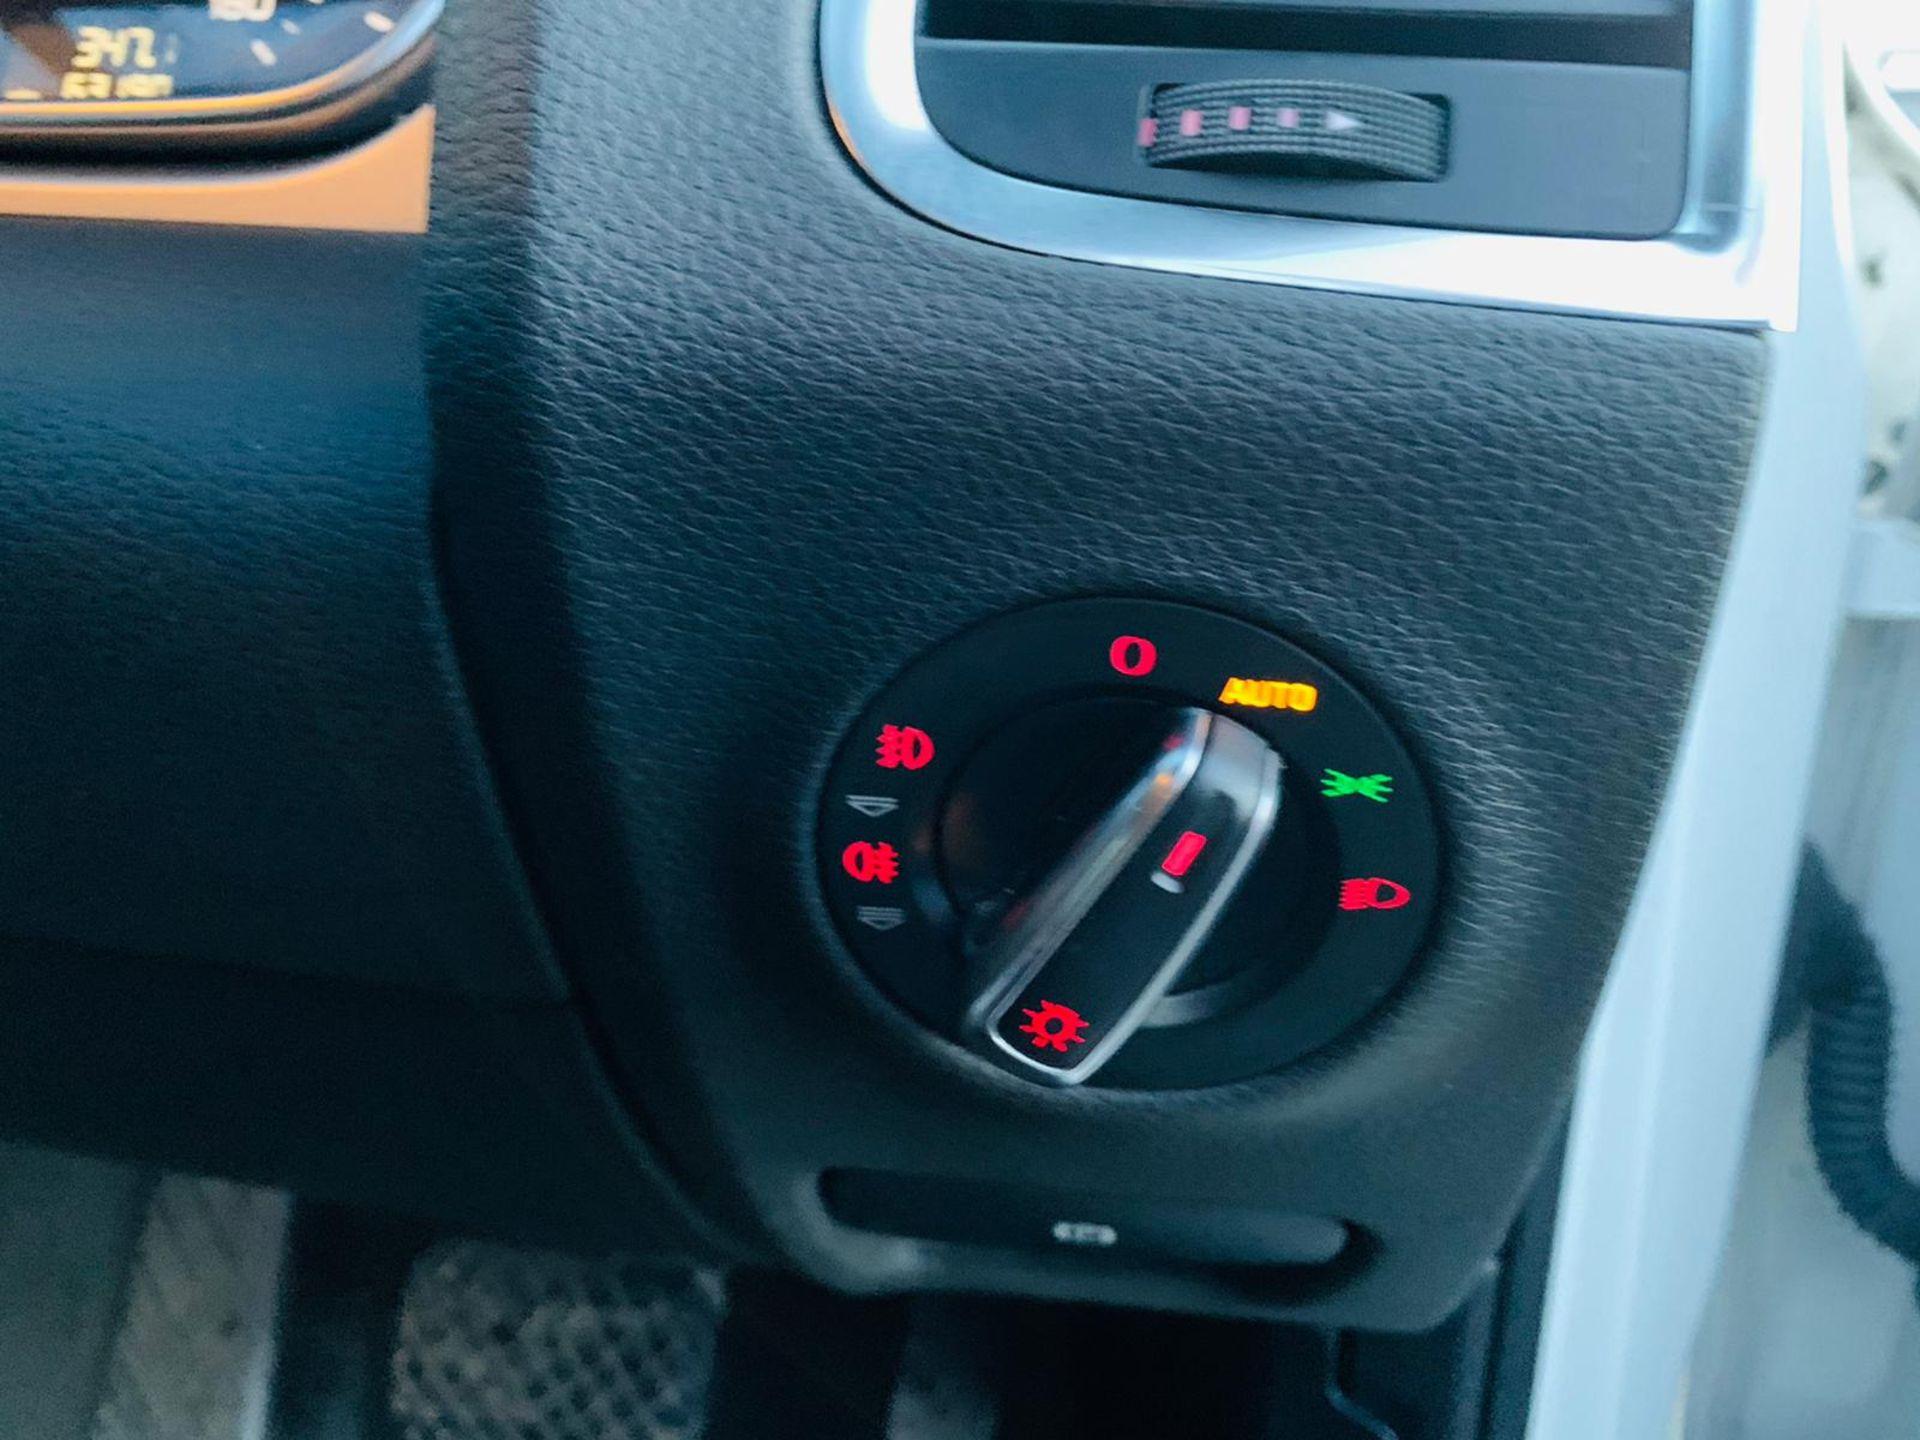 (Reserve Met)Audi Q7 3.0 TDI Quattro S Line Plus Auto (7 Seats) - 12 Reg - Only 63k Miles -Sat Nav- - Image 27 of 37